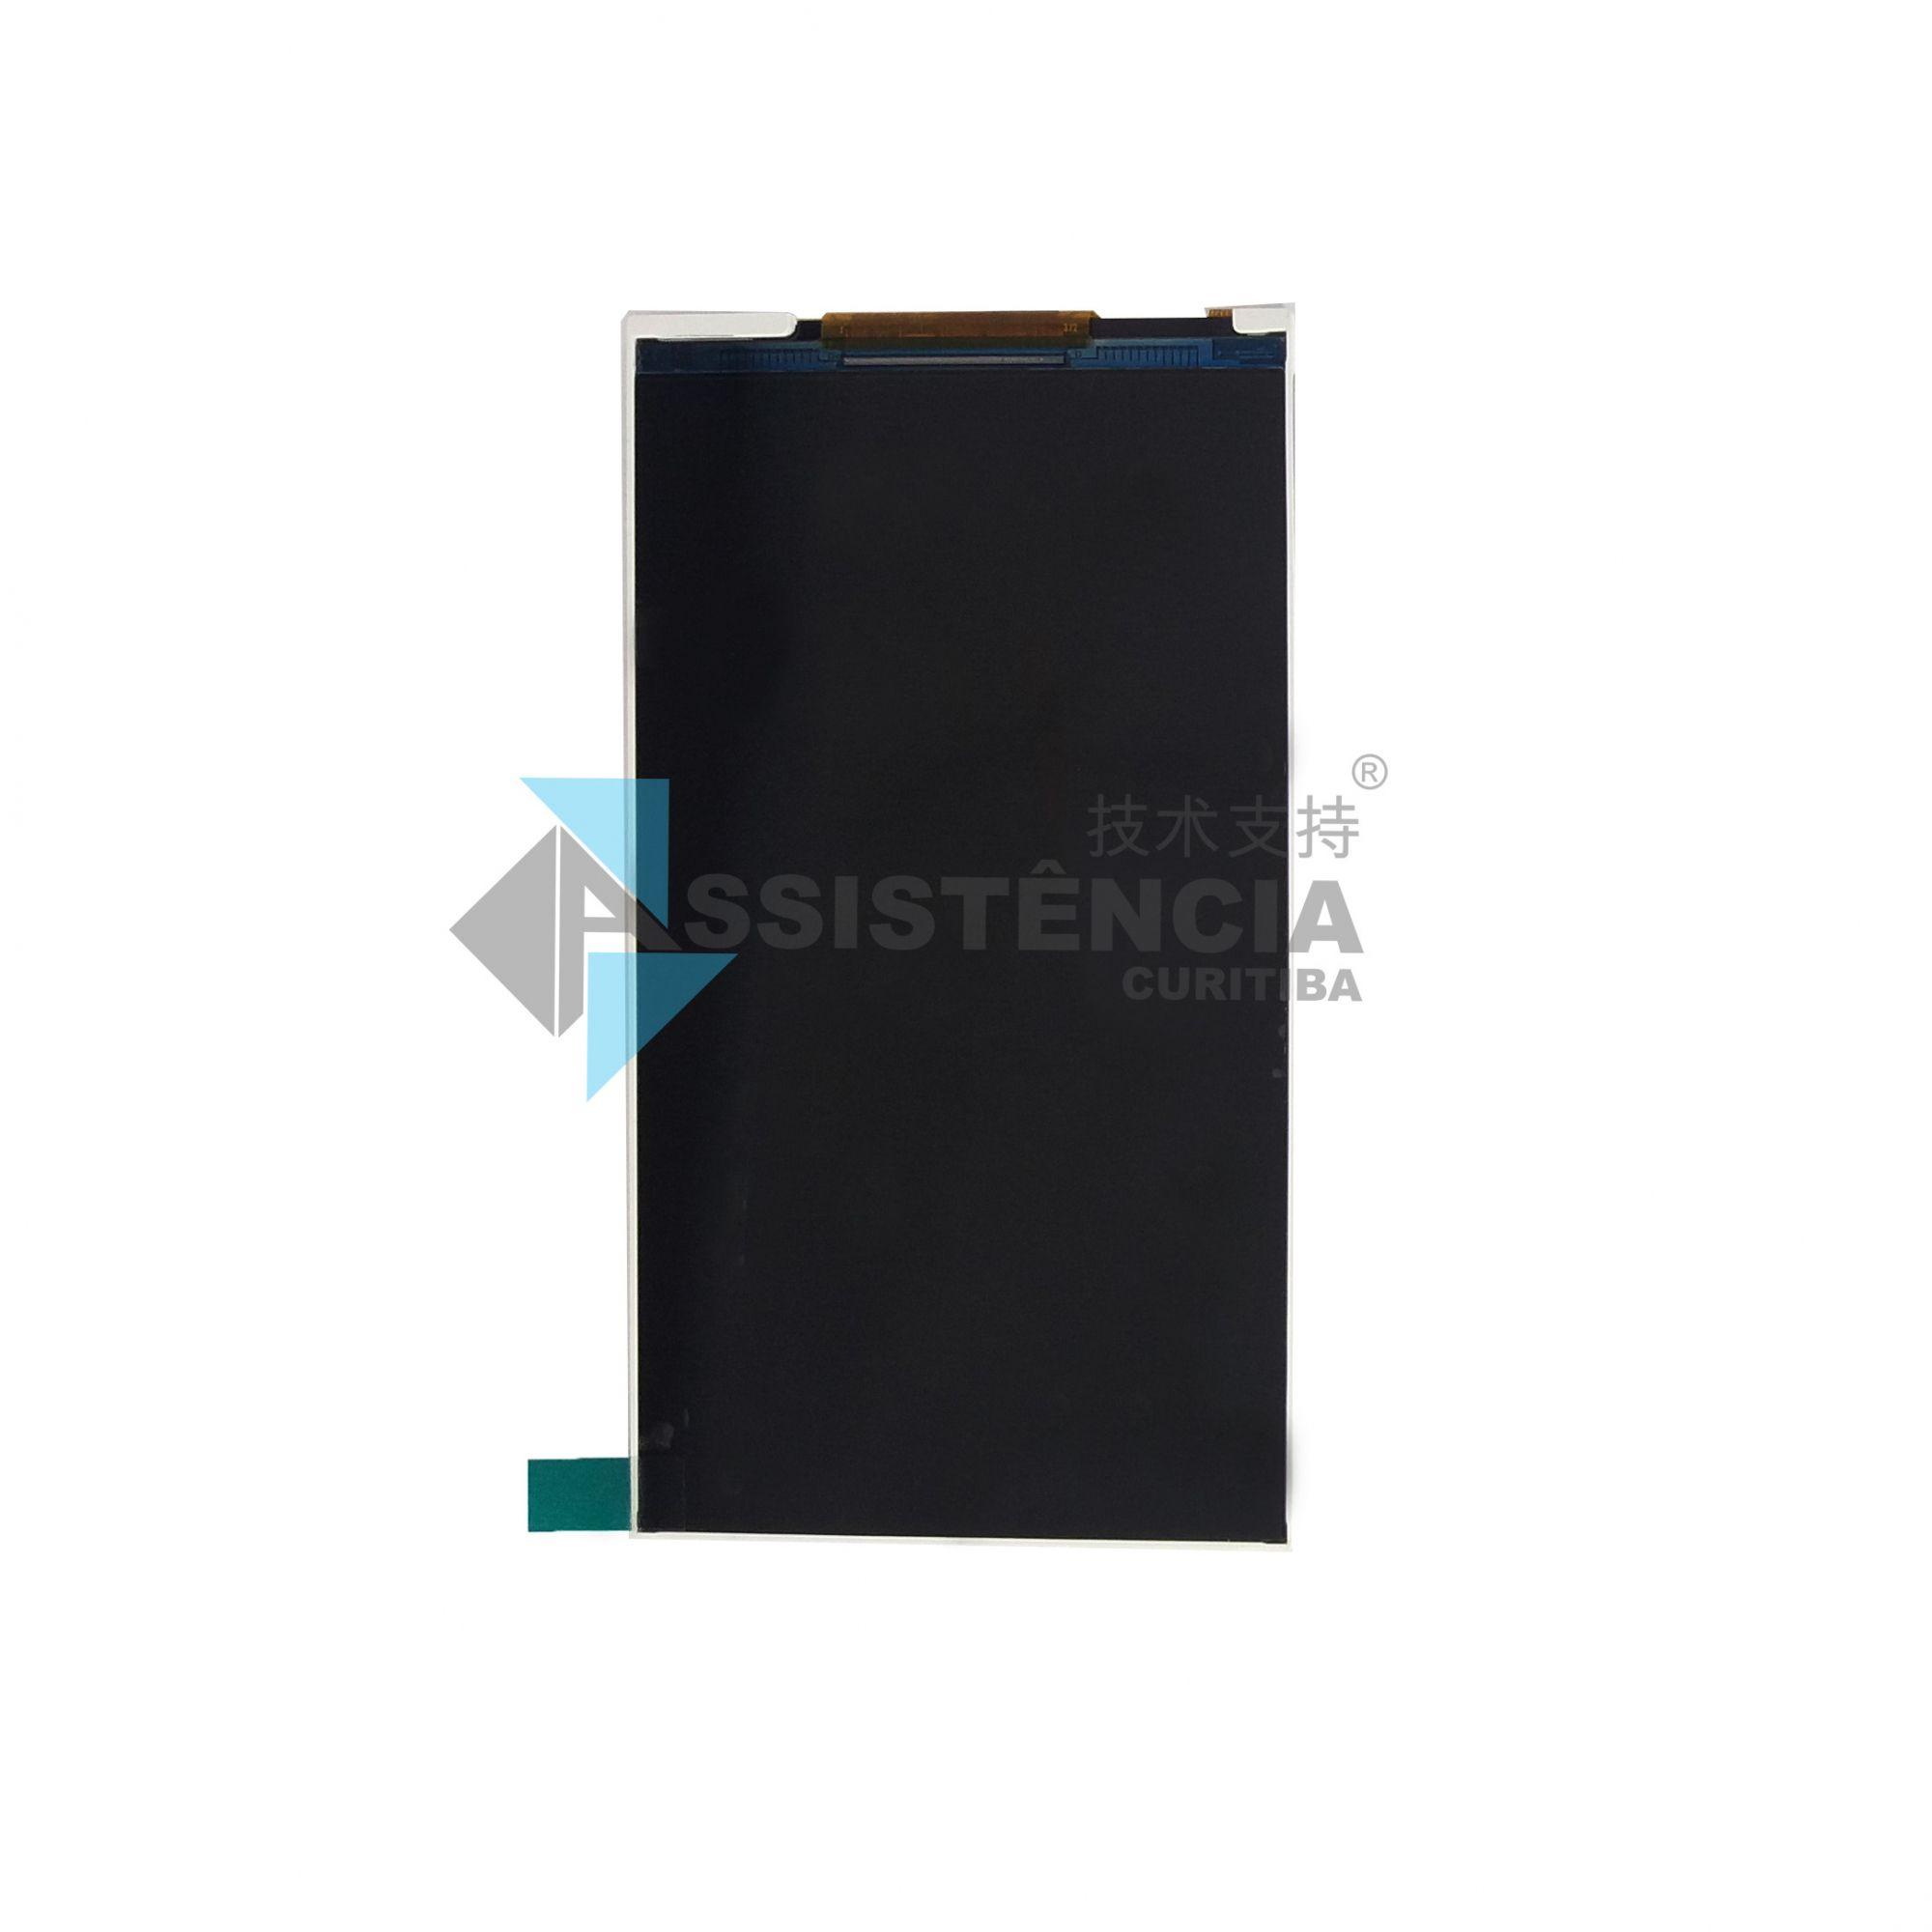 TELA DISPLAY LCD CELULAR BLU STUDIO G PLUS S510